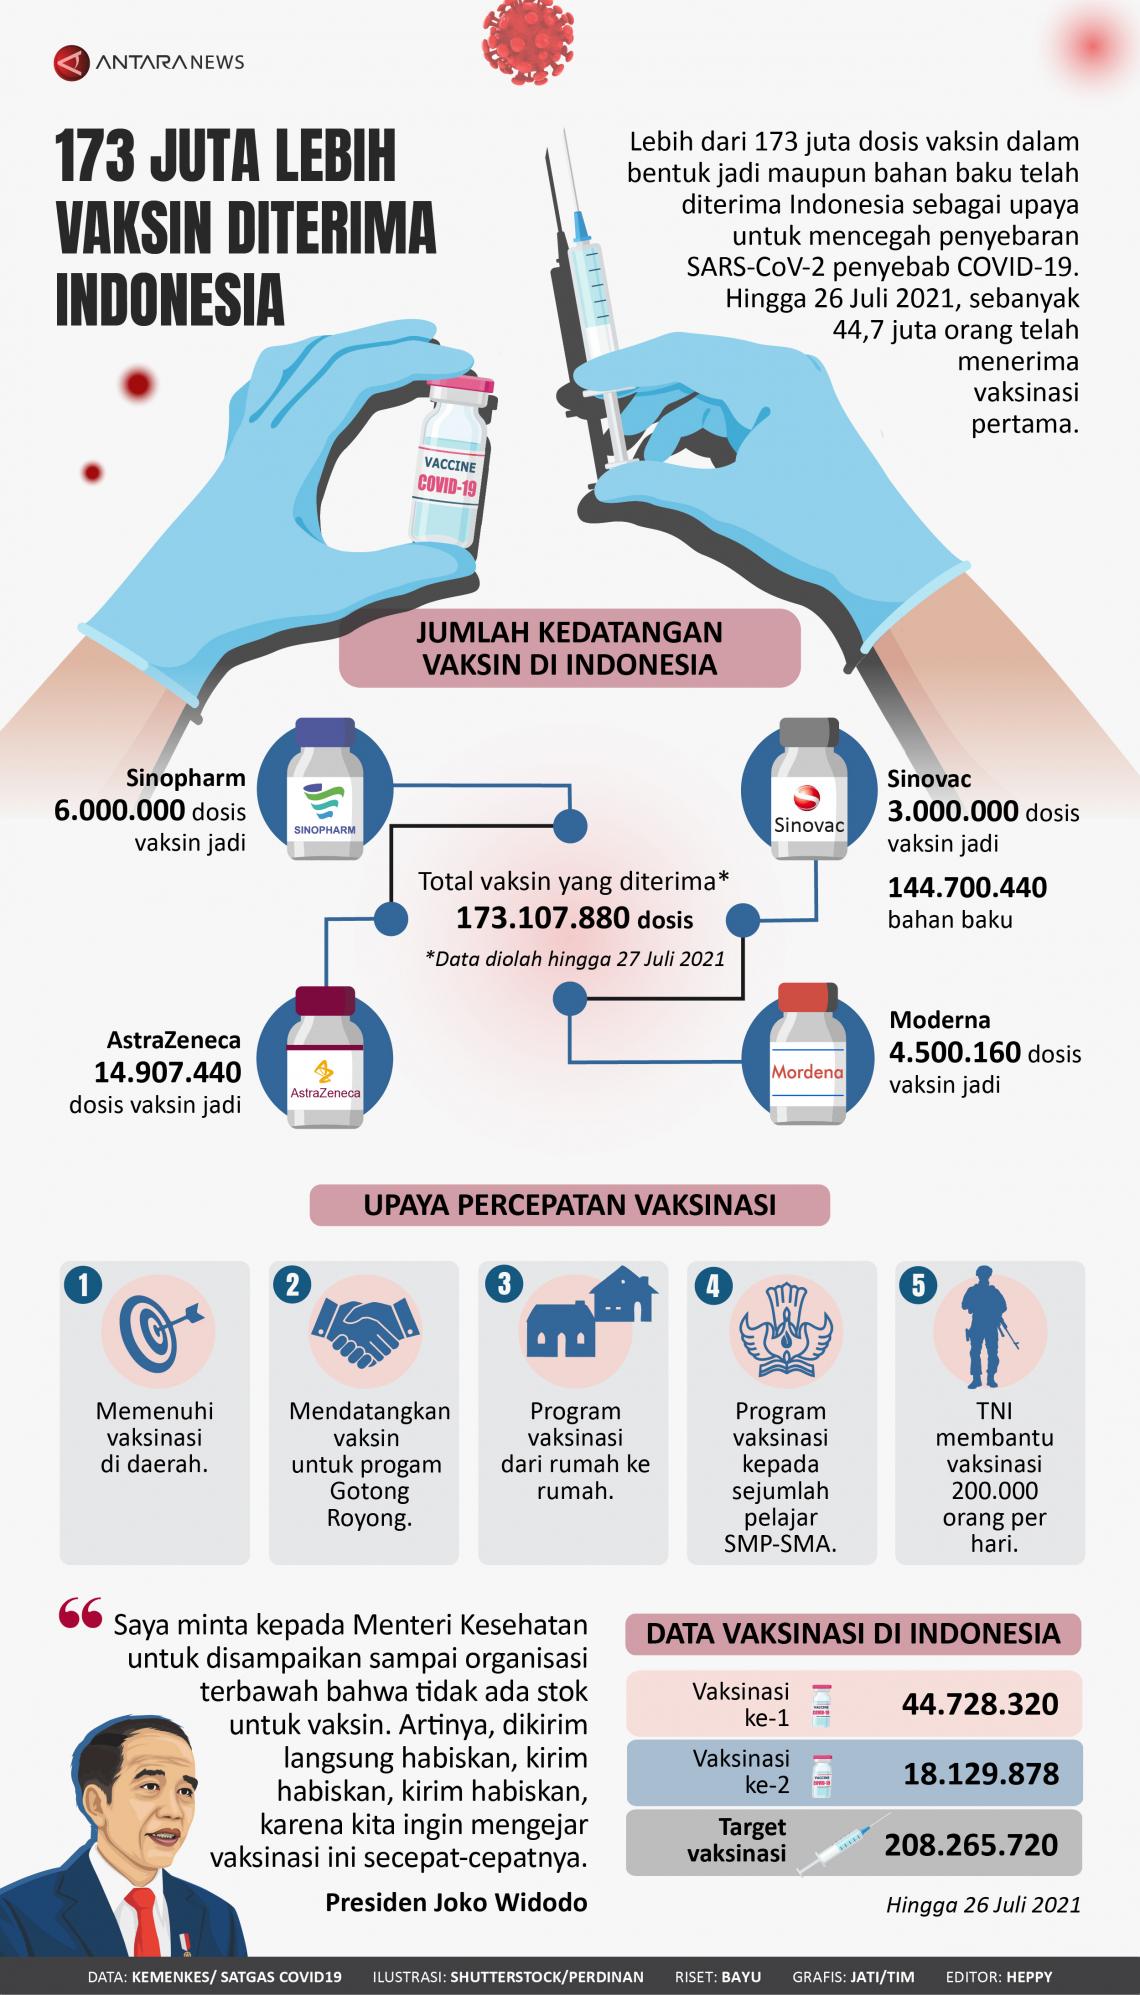 173 juta lebih vaksin diterima Indonesia